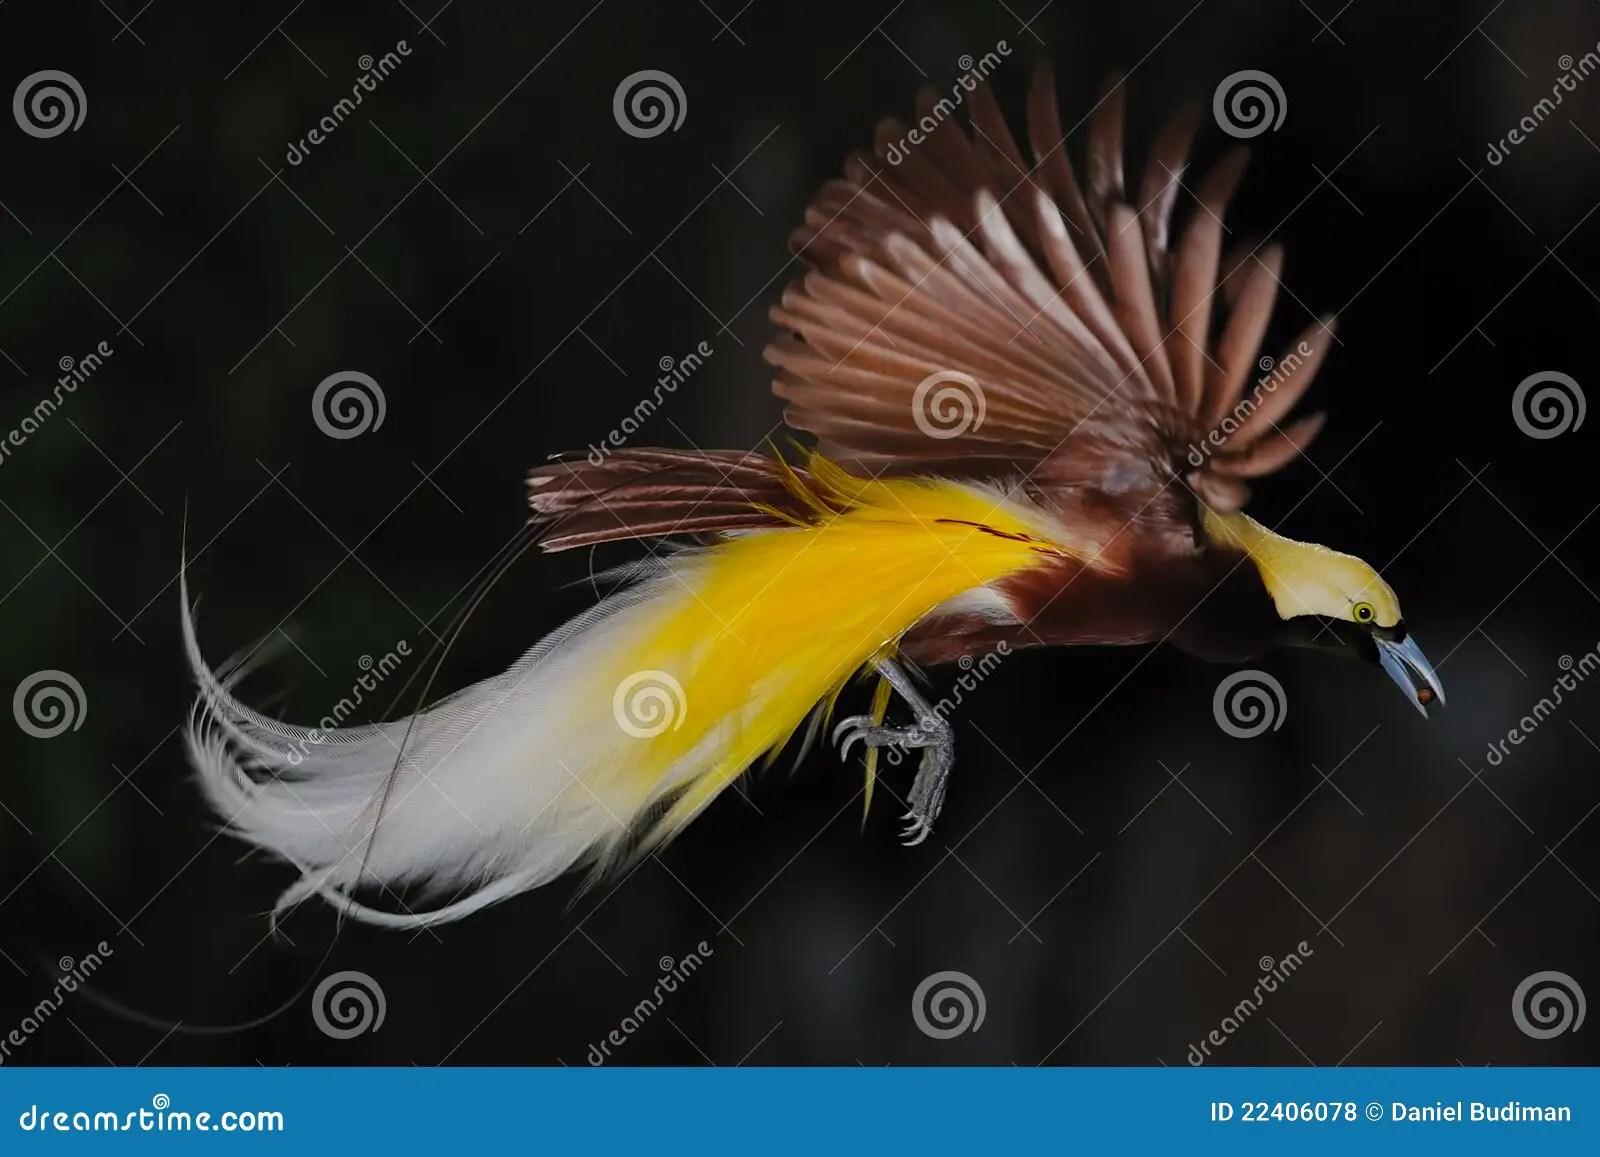 Bird Of Paradise Hd Wallpaper Bird Of Paradise In Flight Stock Photo Image Of Male